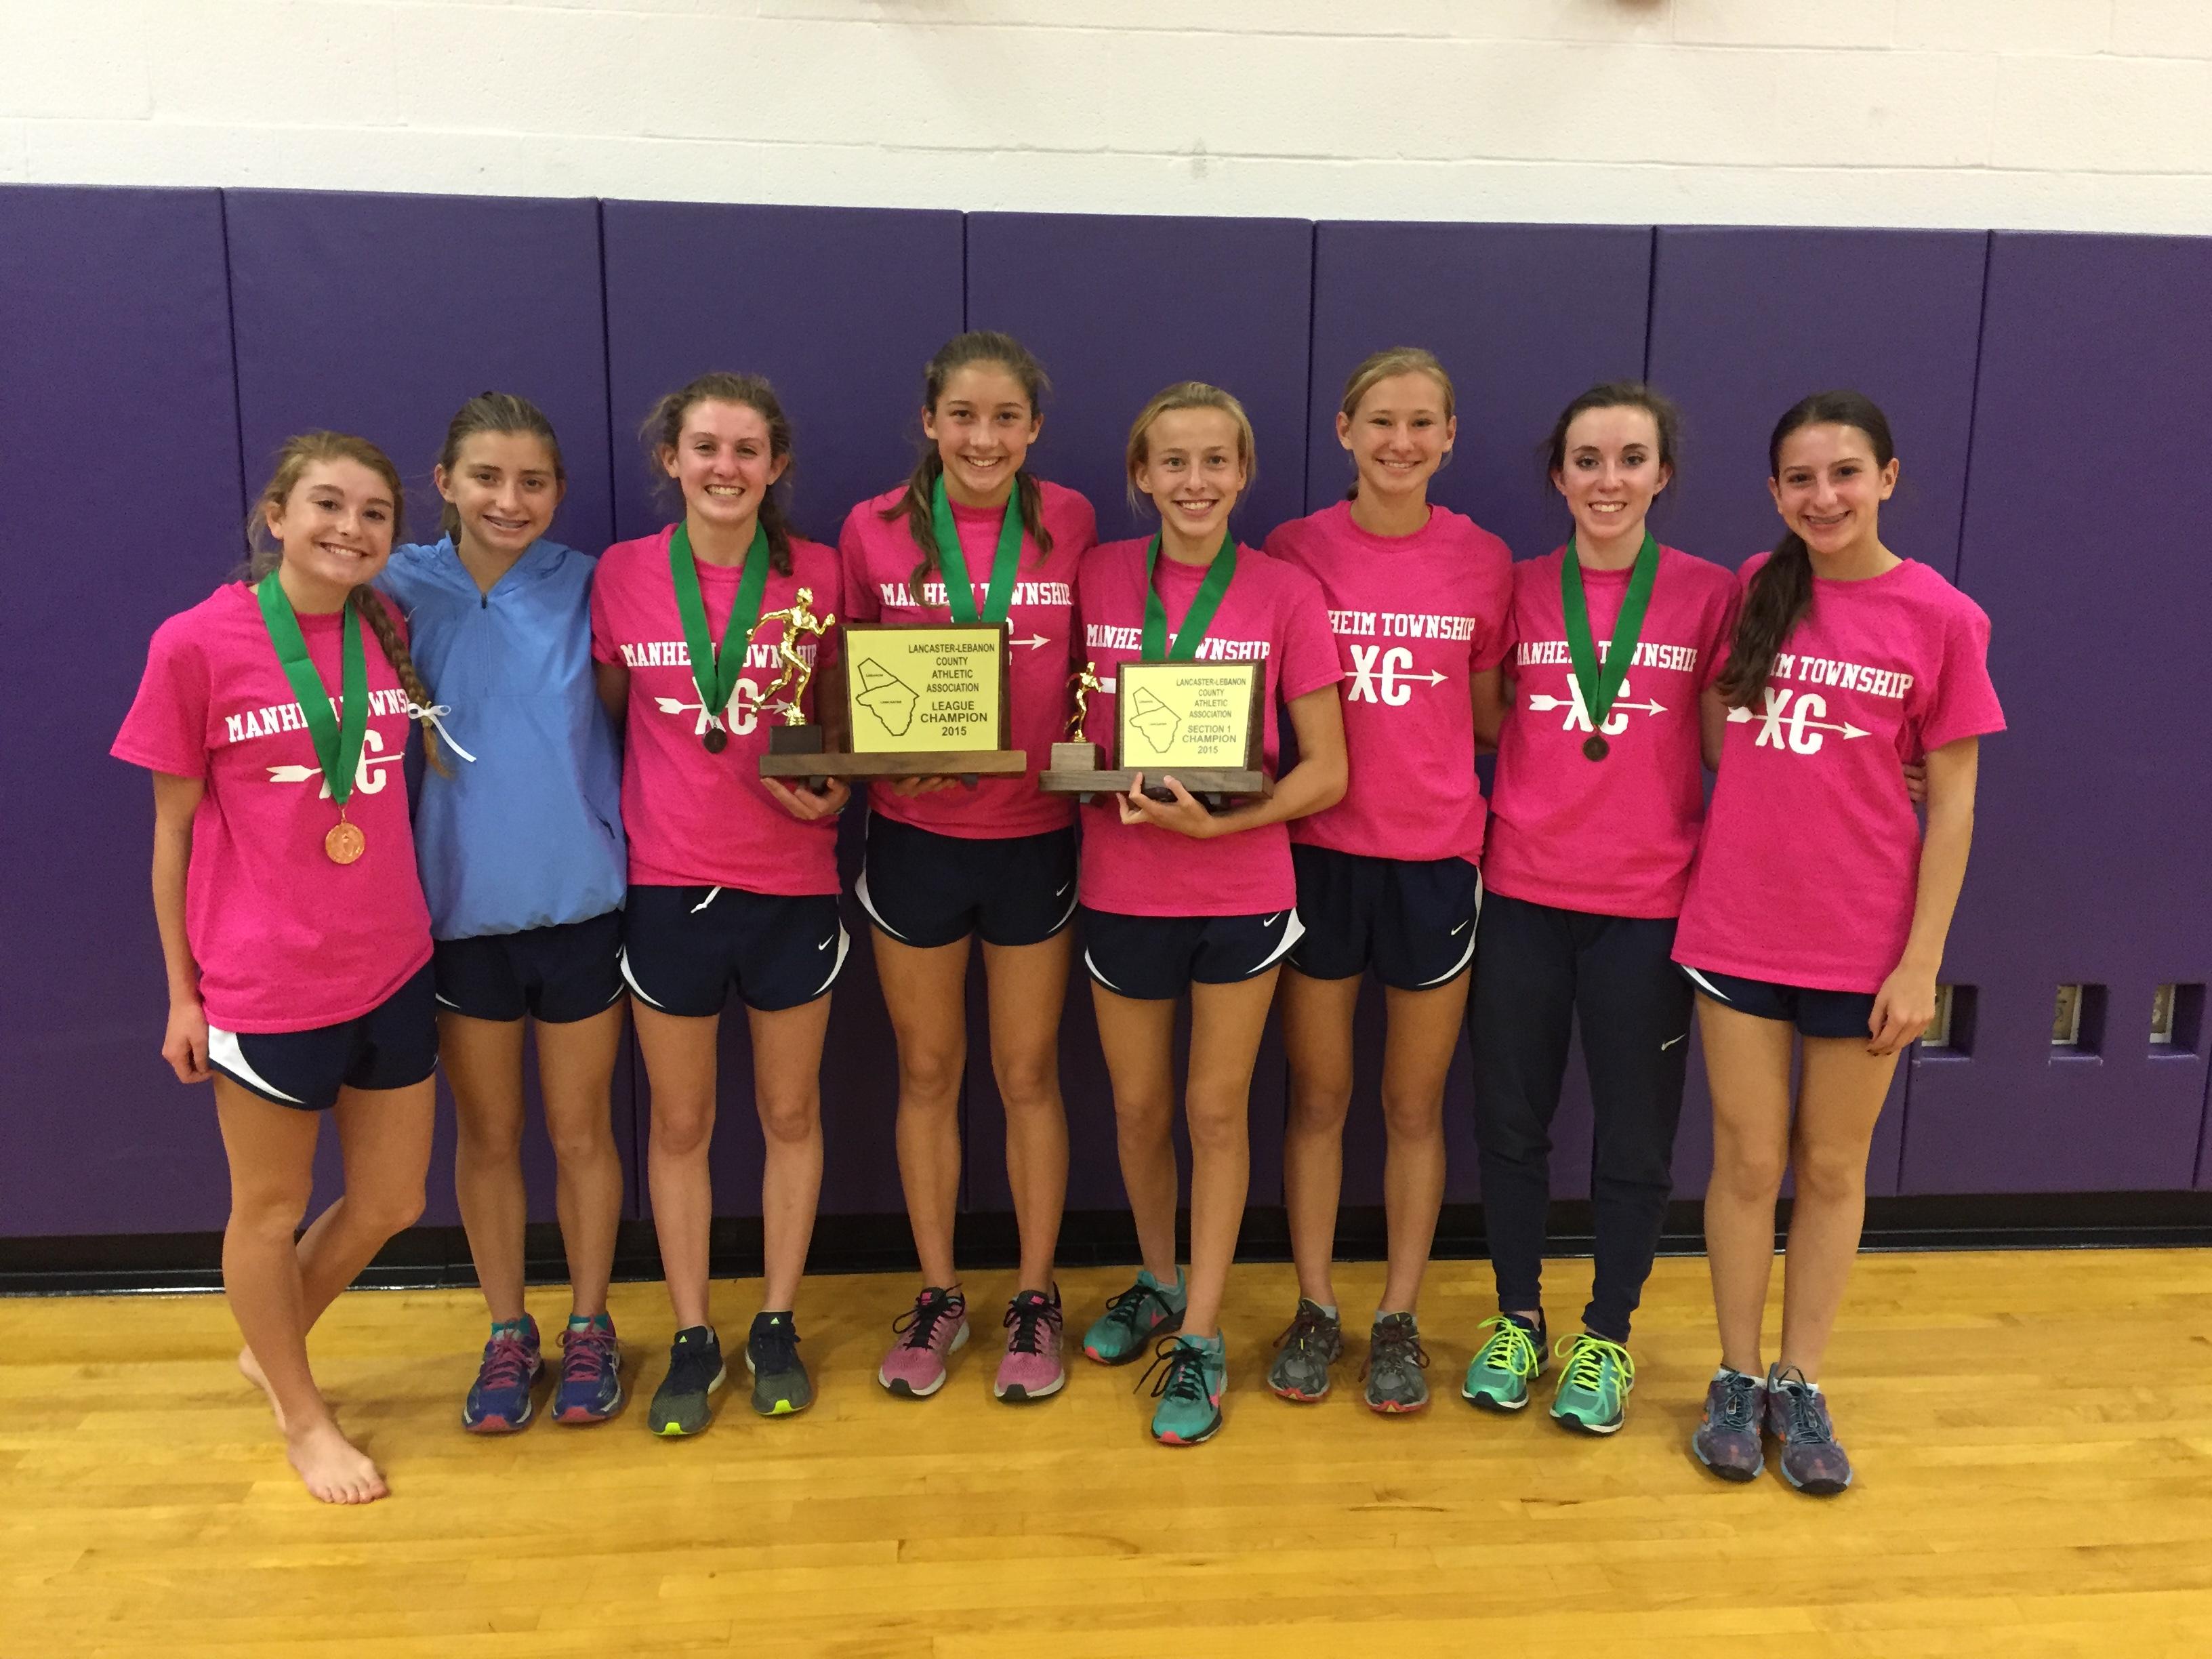 girls results of saydel 2015 cross country meet